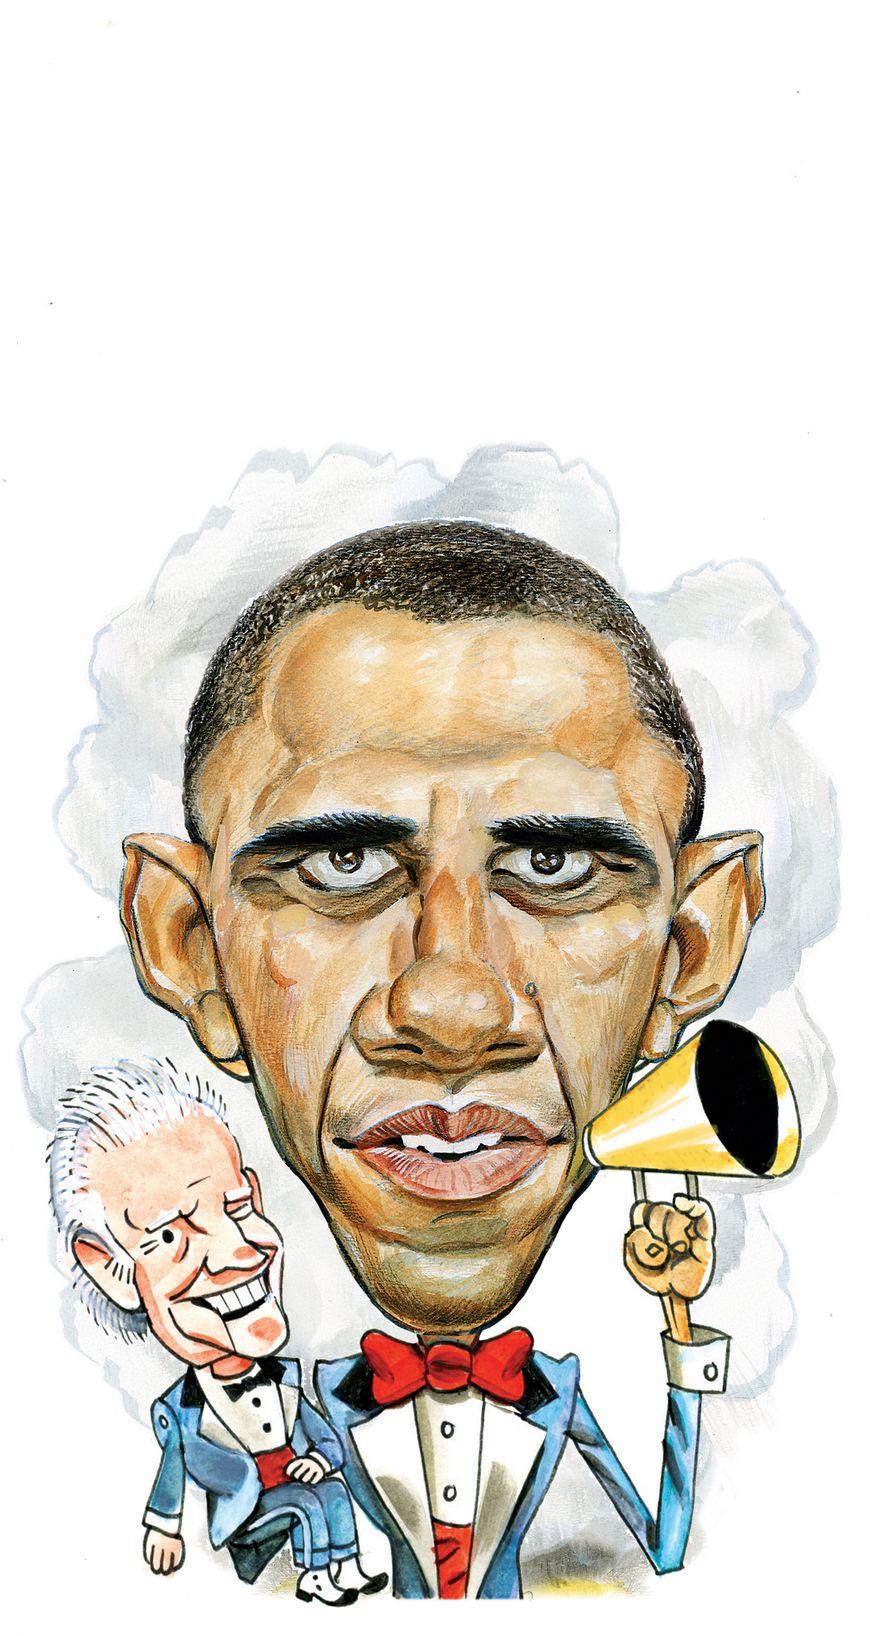 Illustration Debate by Alexander Hunter for The Washington Times